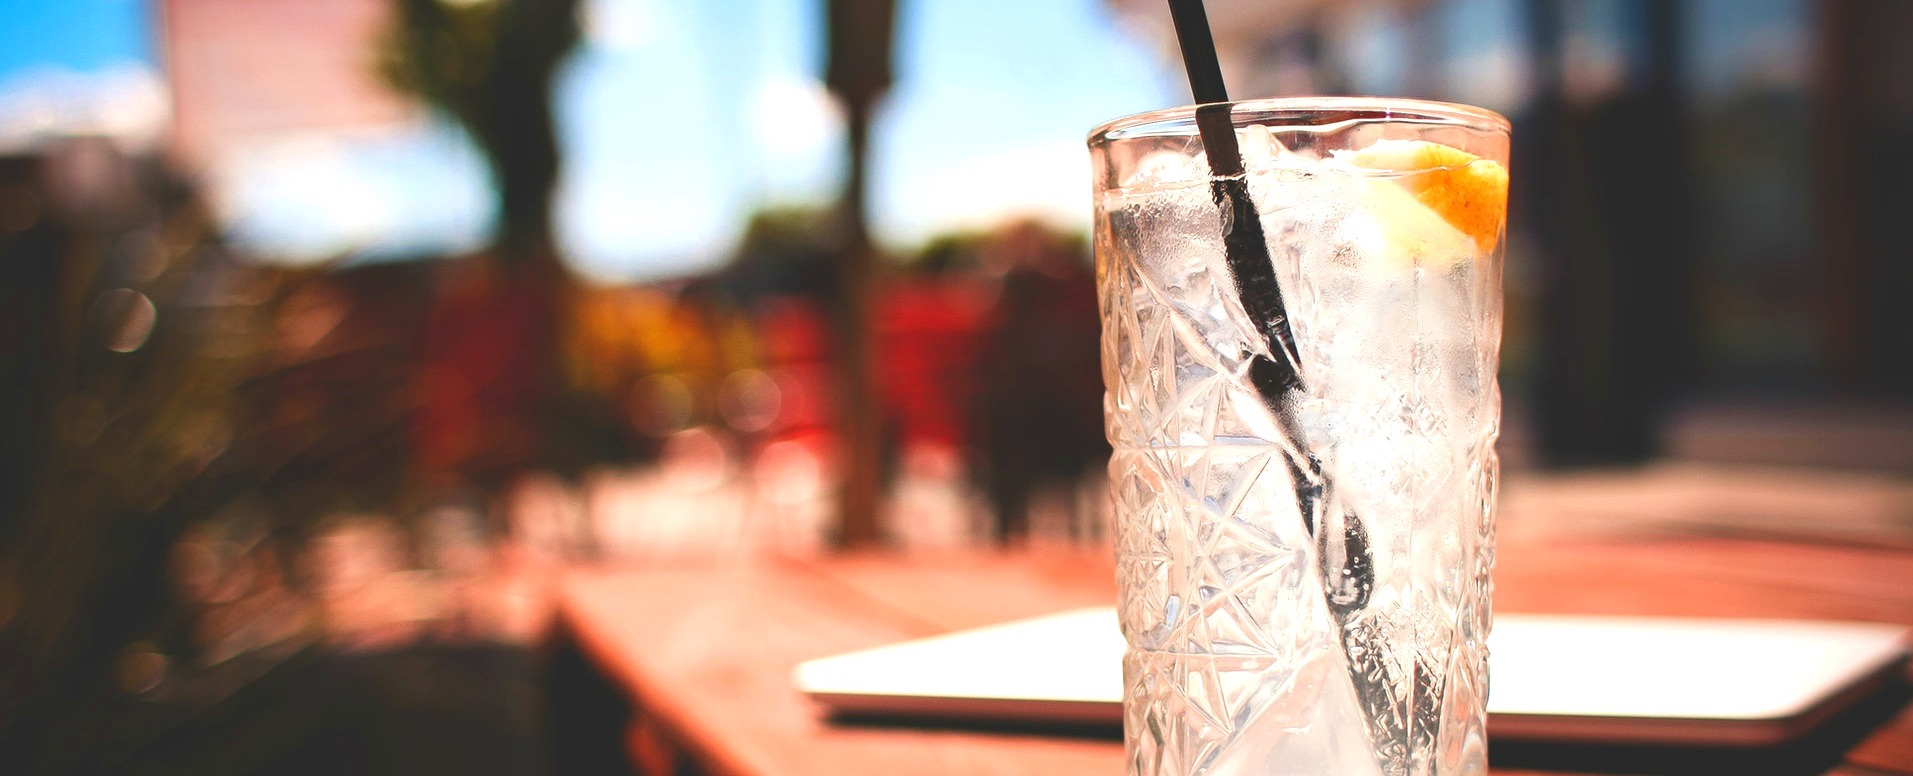 4. Start at Ushuaia, finish in HÏ - Ibiza